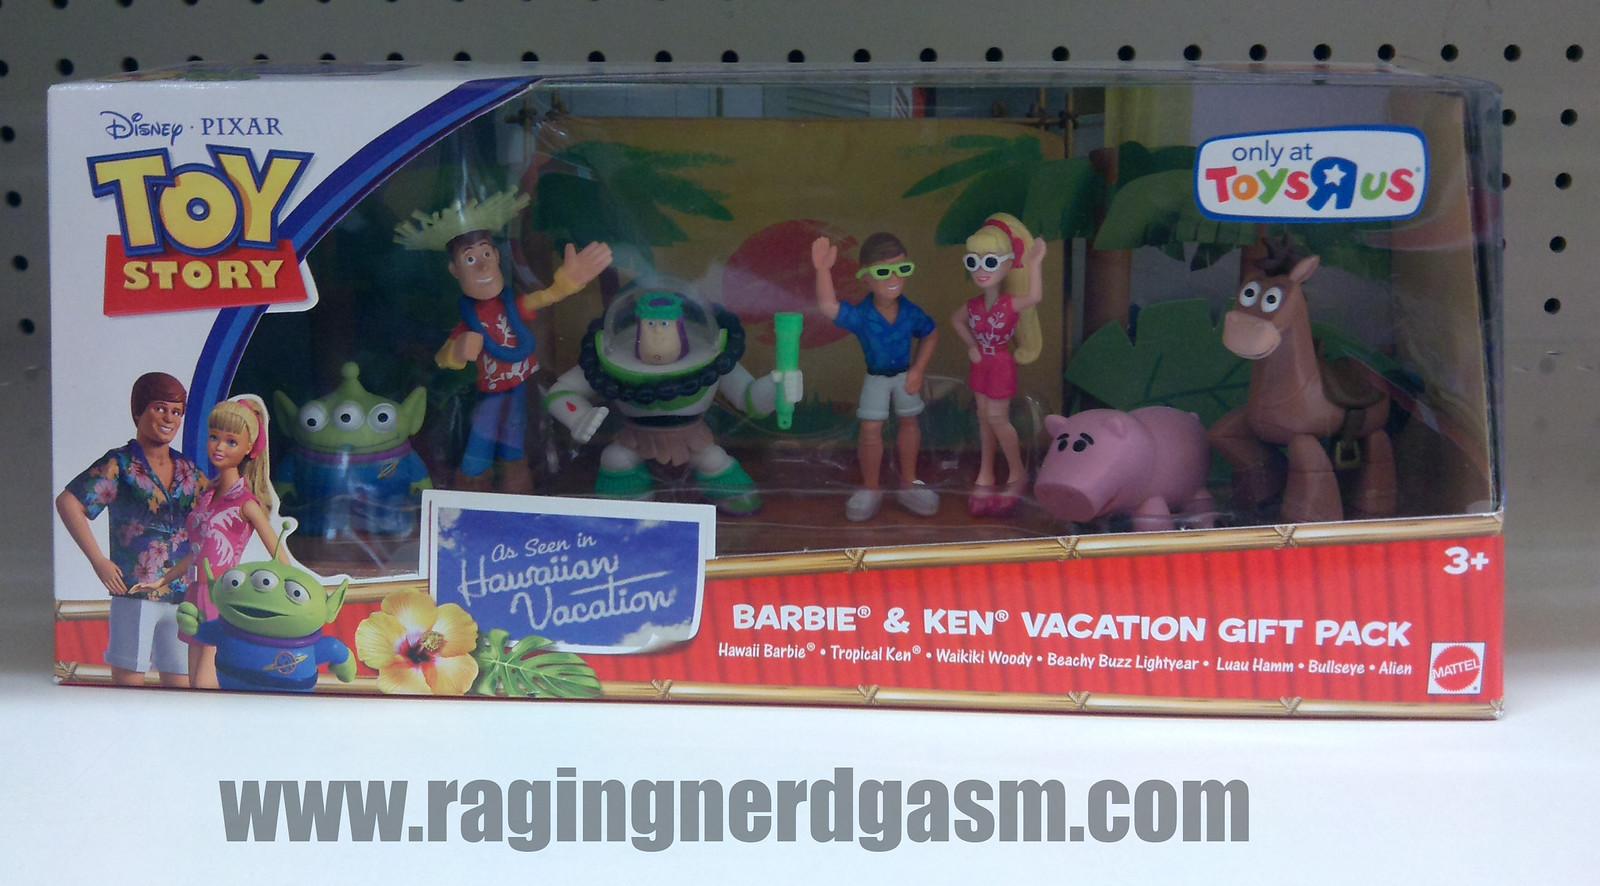 Pixar's Toy story Figurine Gift sets Barbie & Ken vaction gift pack_03